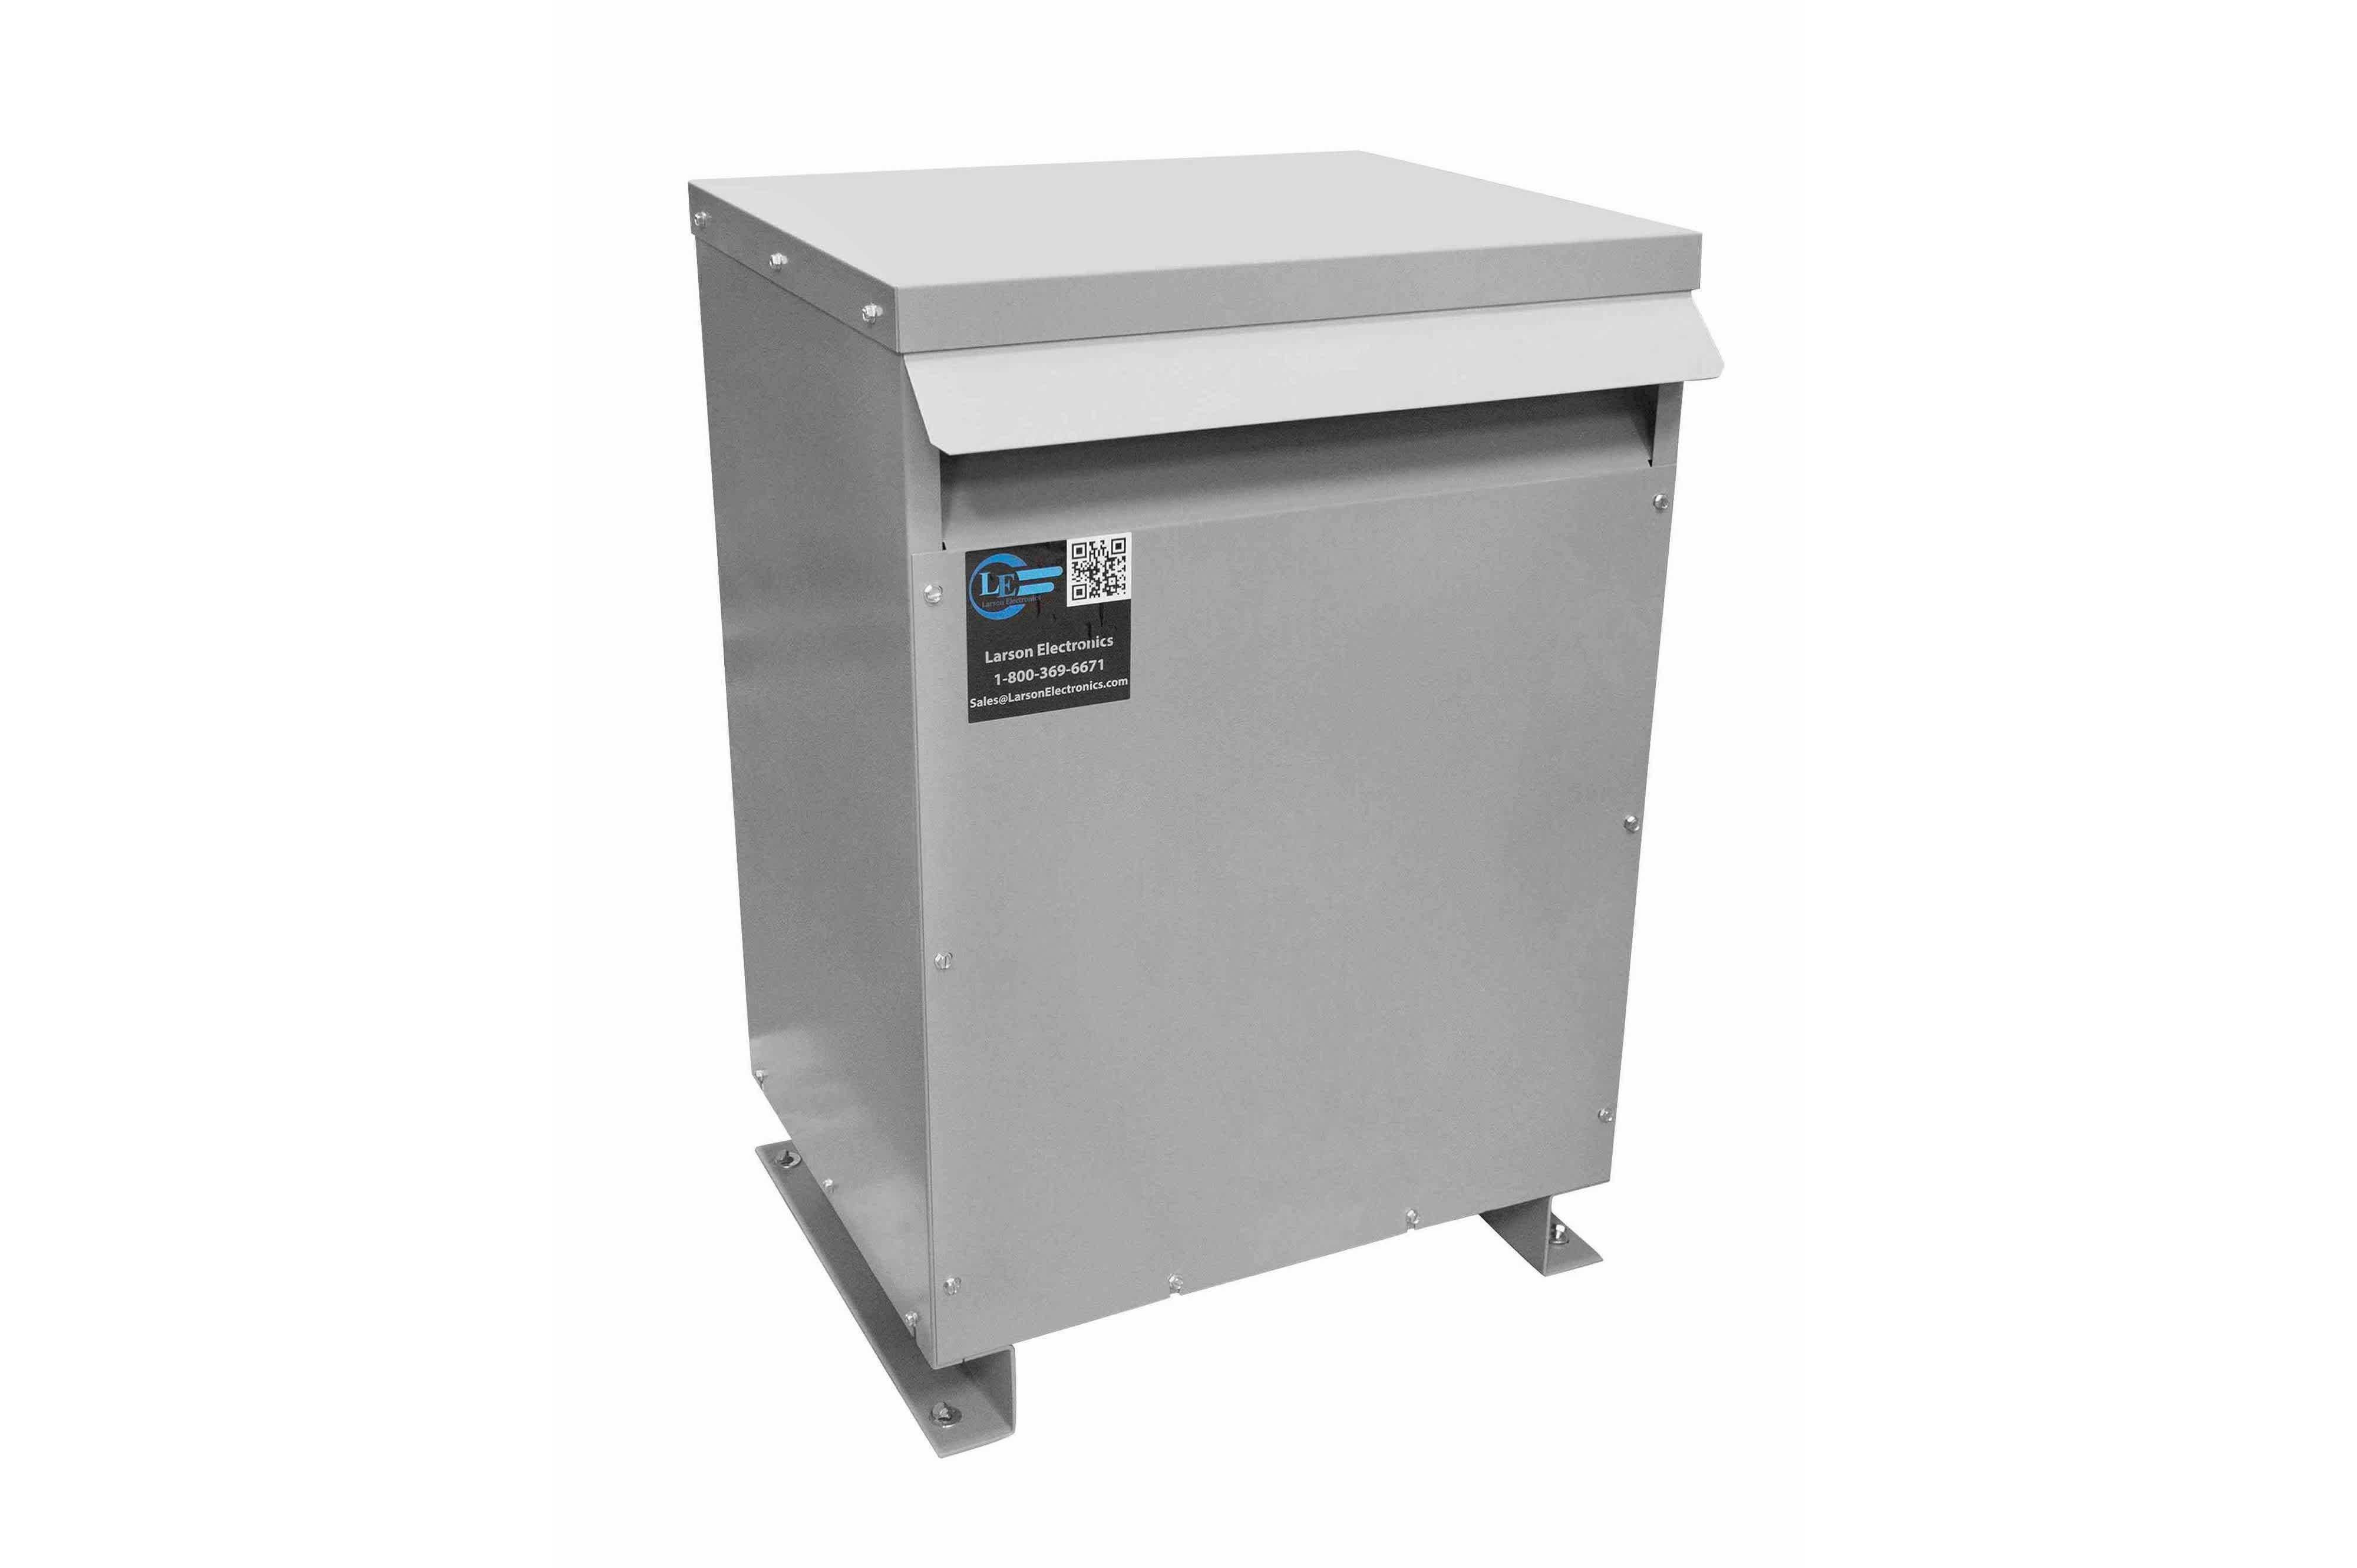 100 kVA 3PH Isolation Transformer, 460V Wye Primary, 400V Delta Secondary, N3R, Ventilated, 60 Hz